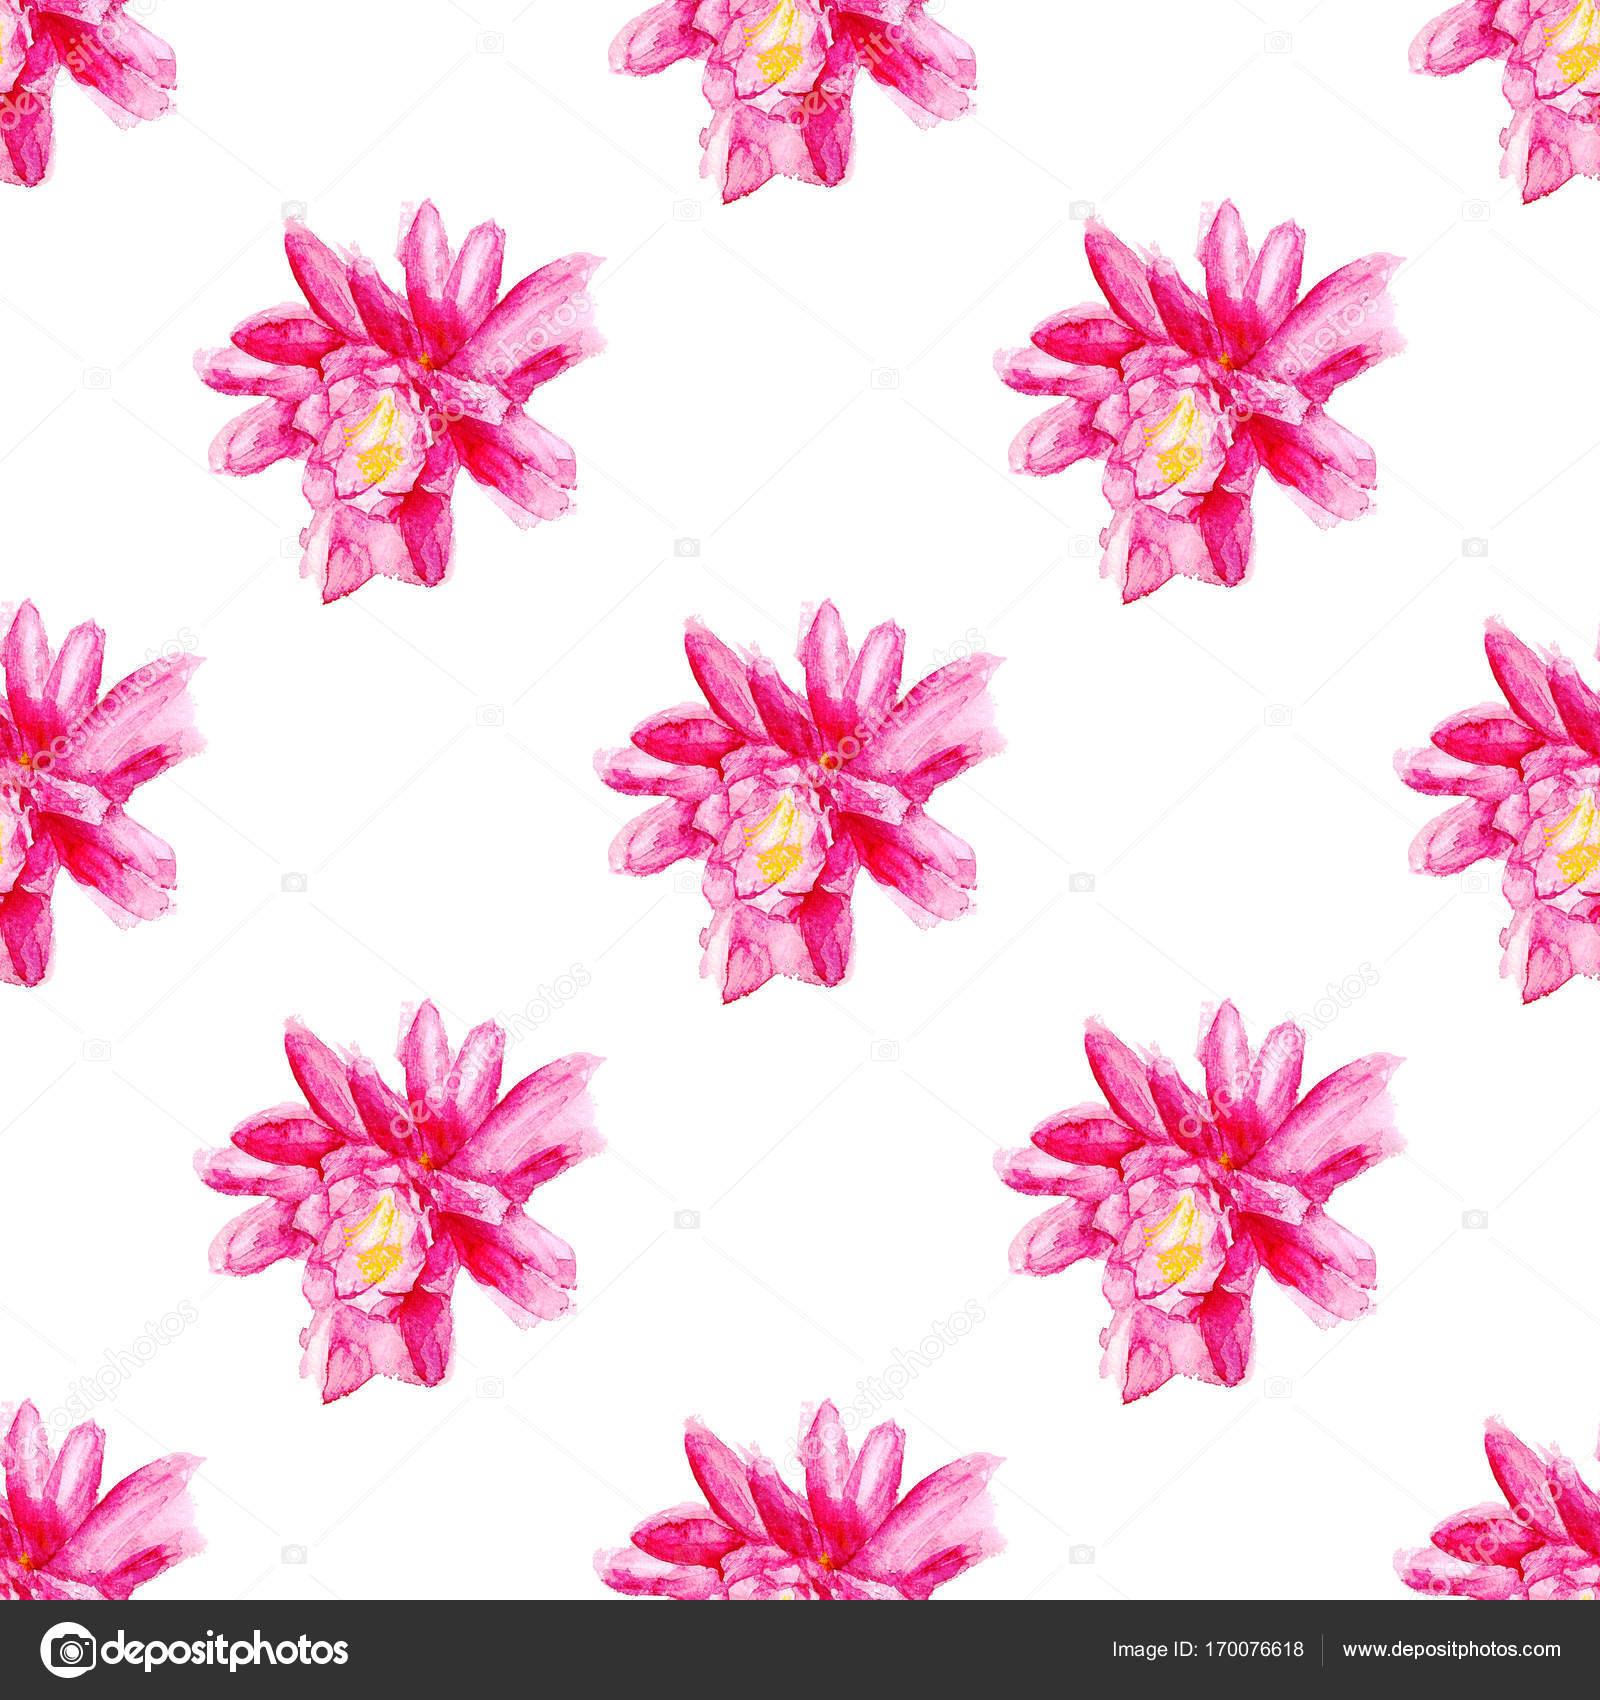 patrones sin fisuras con flor roja — Foto de stock © shoshina #170076618